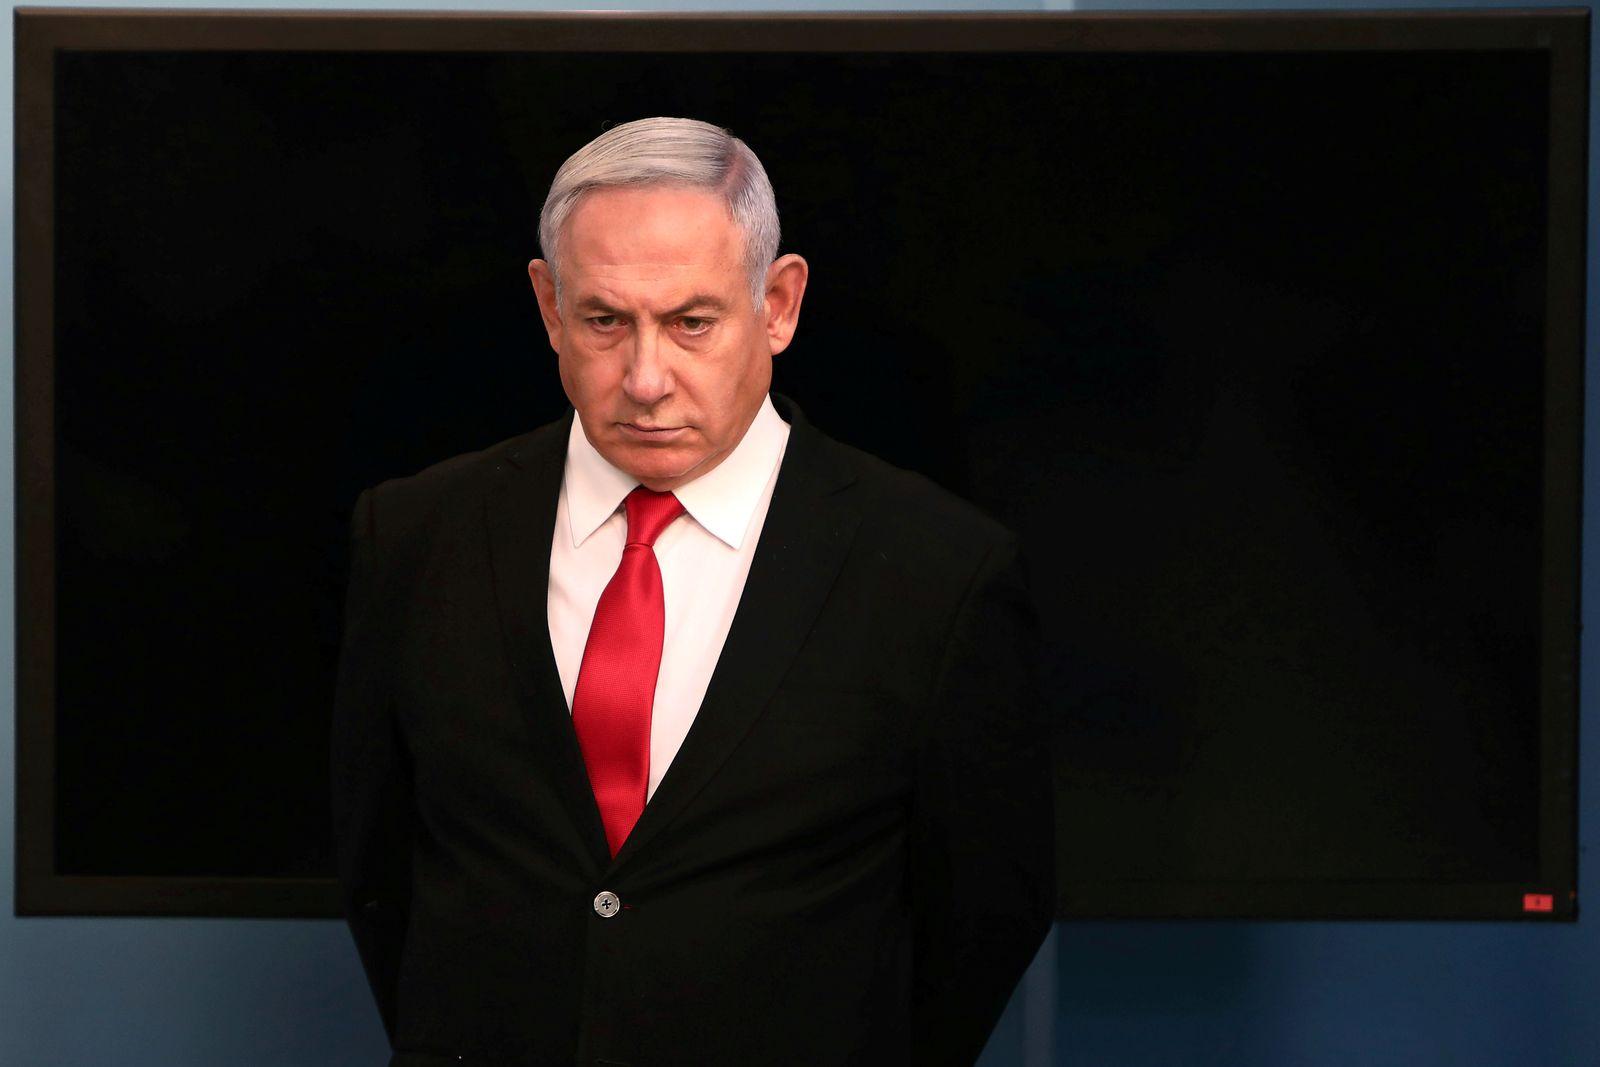 FILE PHOTO: Israeli Prime Minister Benjamin Netanyahu delivers a speech at his Jerusalem office